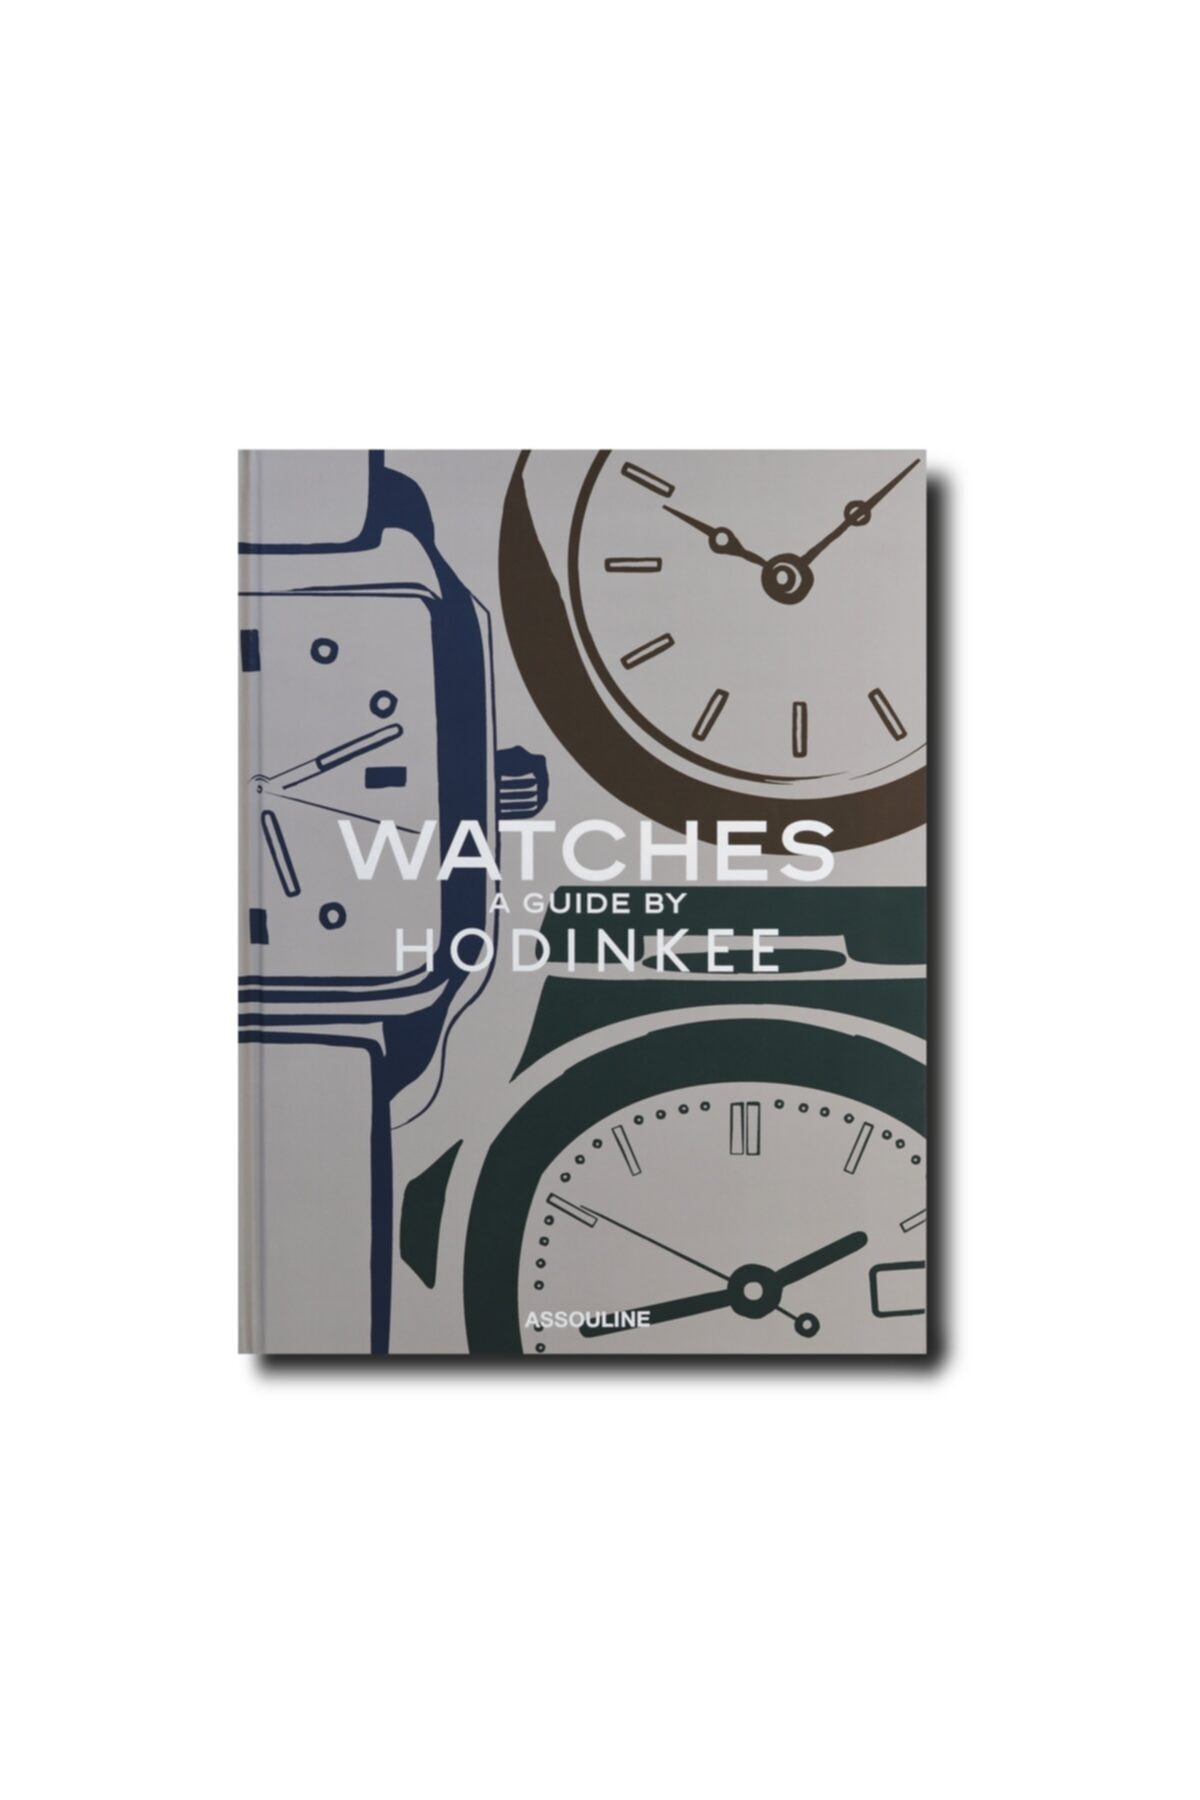 Watches, A Guıde By Hodınkee